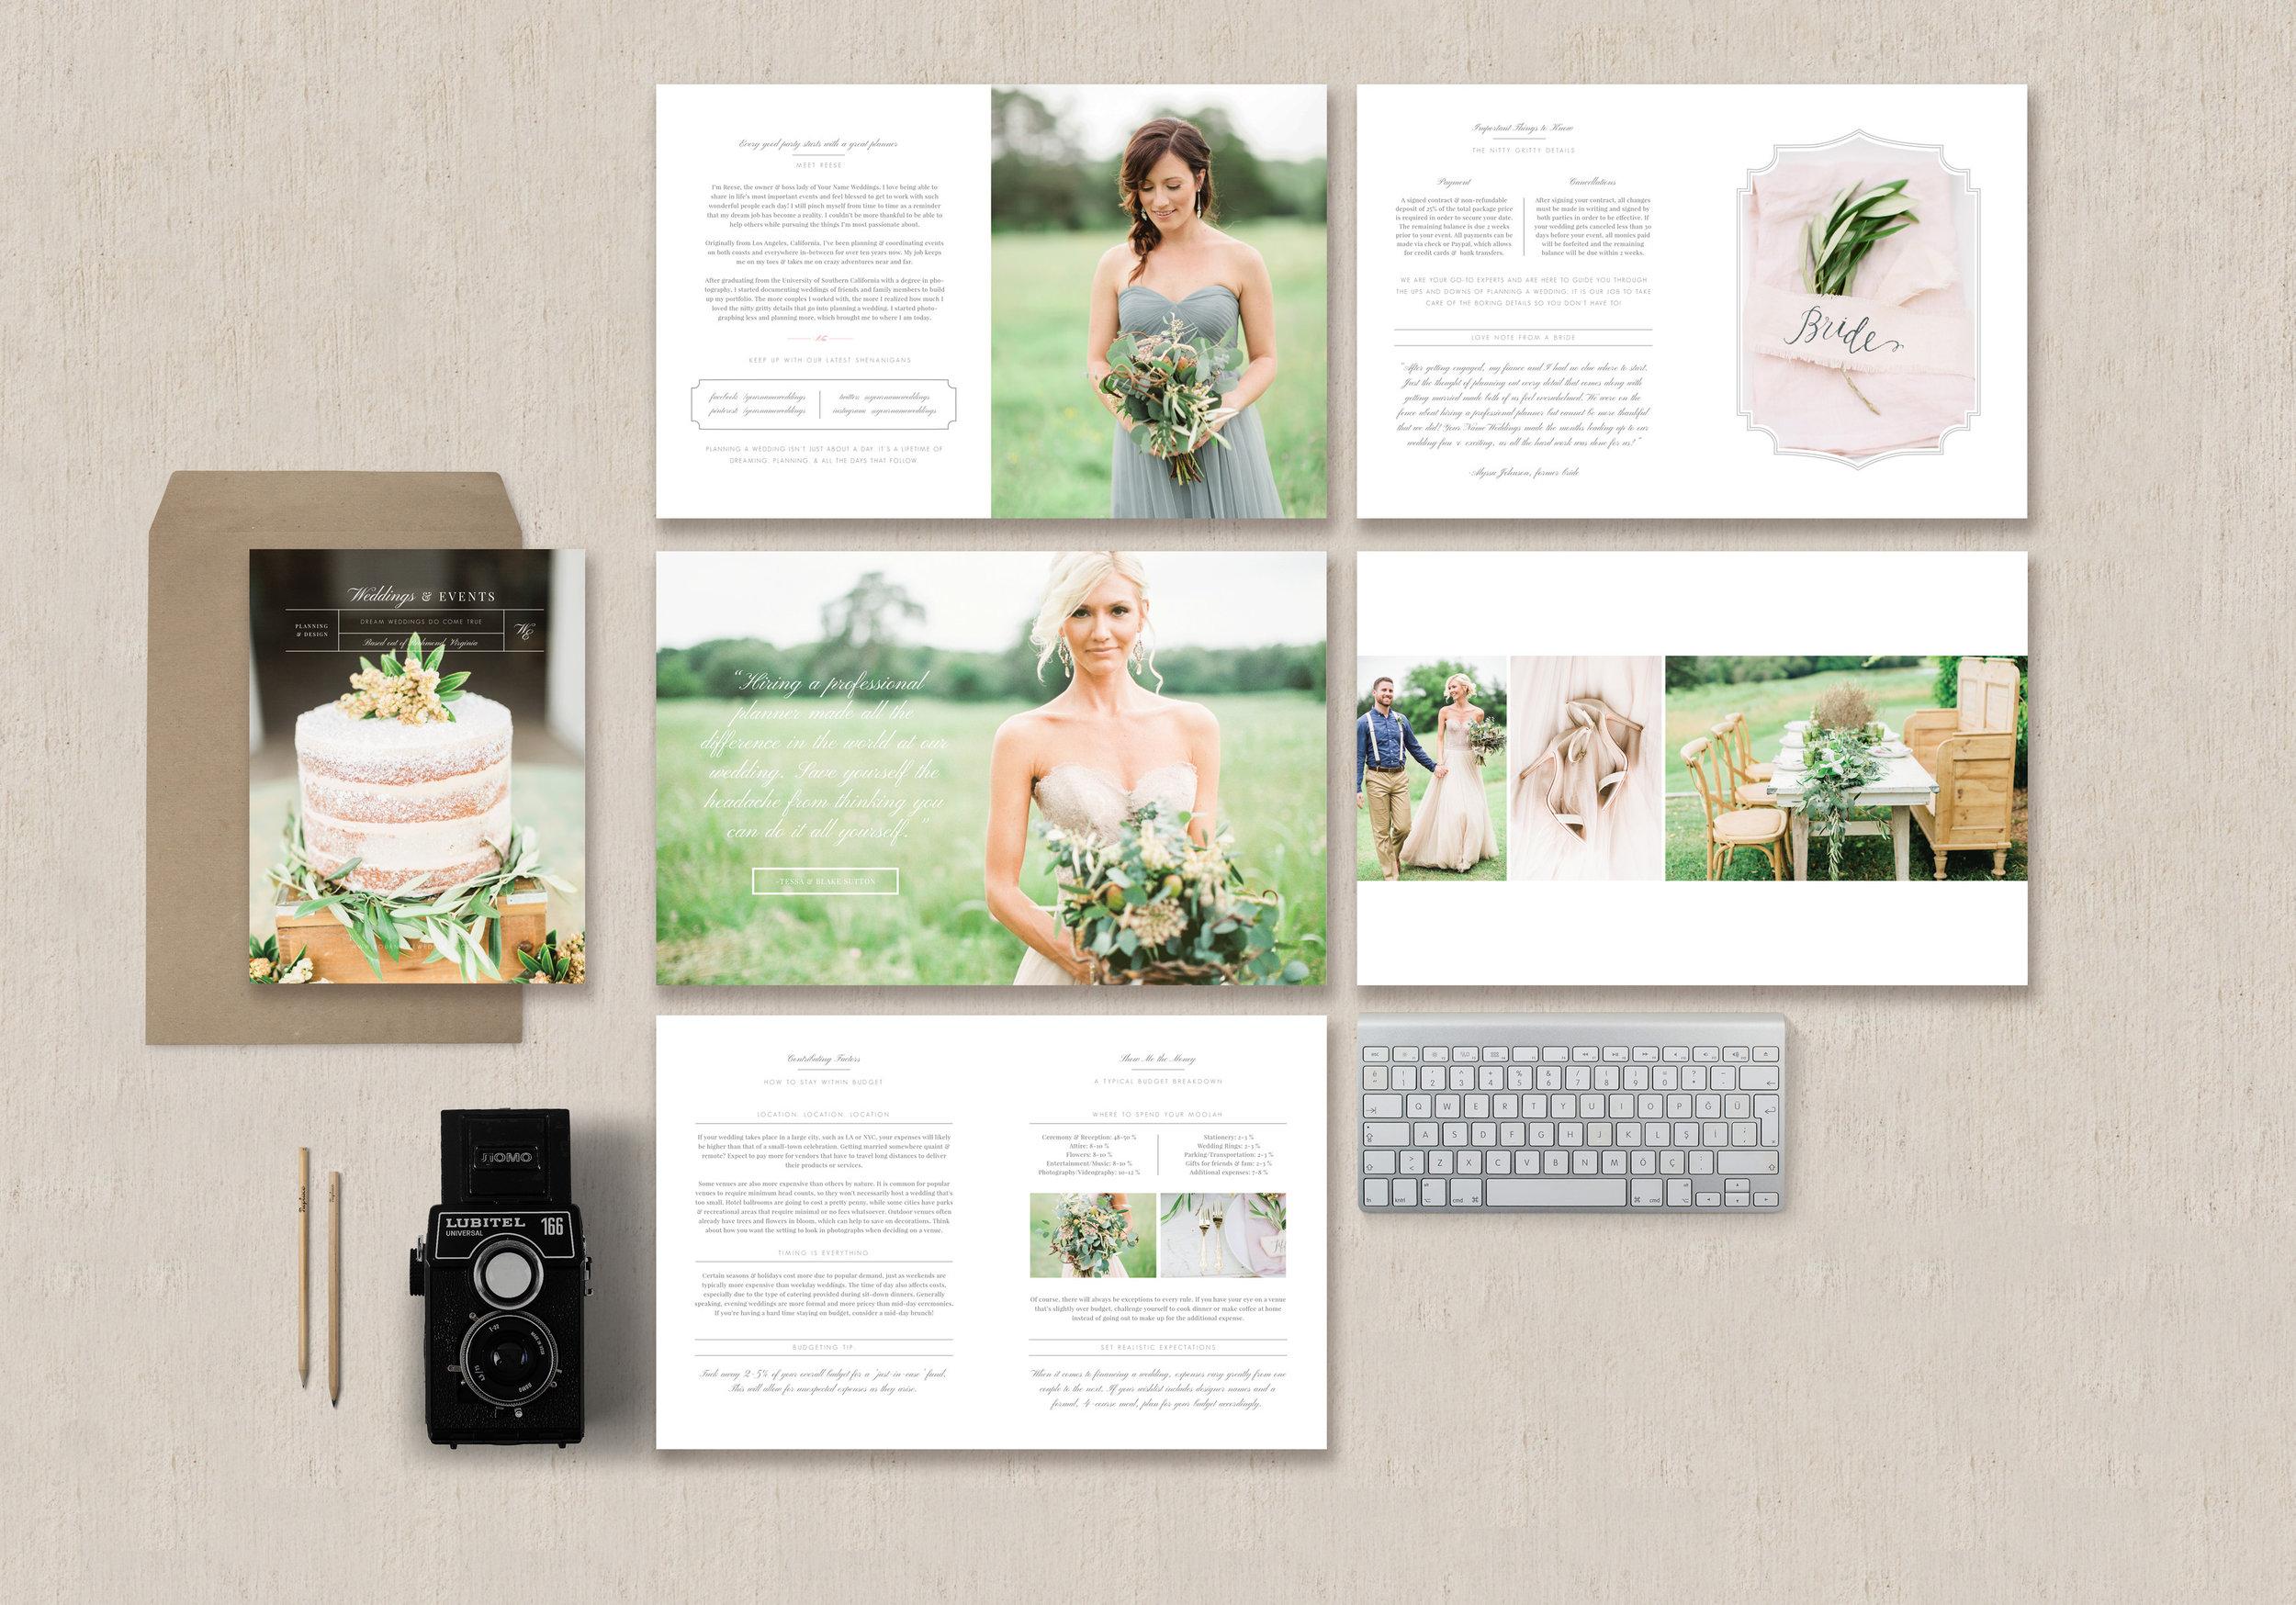 Magazine Template for Wedding Planners & Event Designers - Eucalyptus